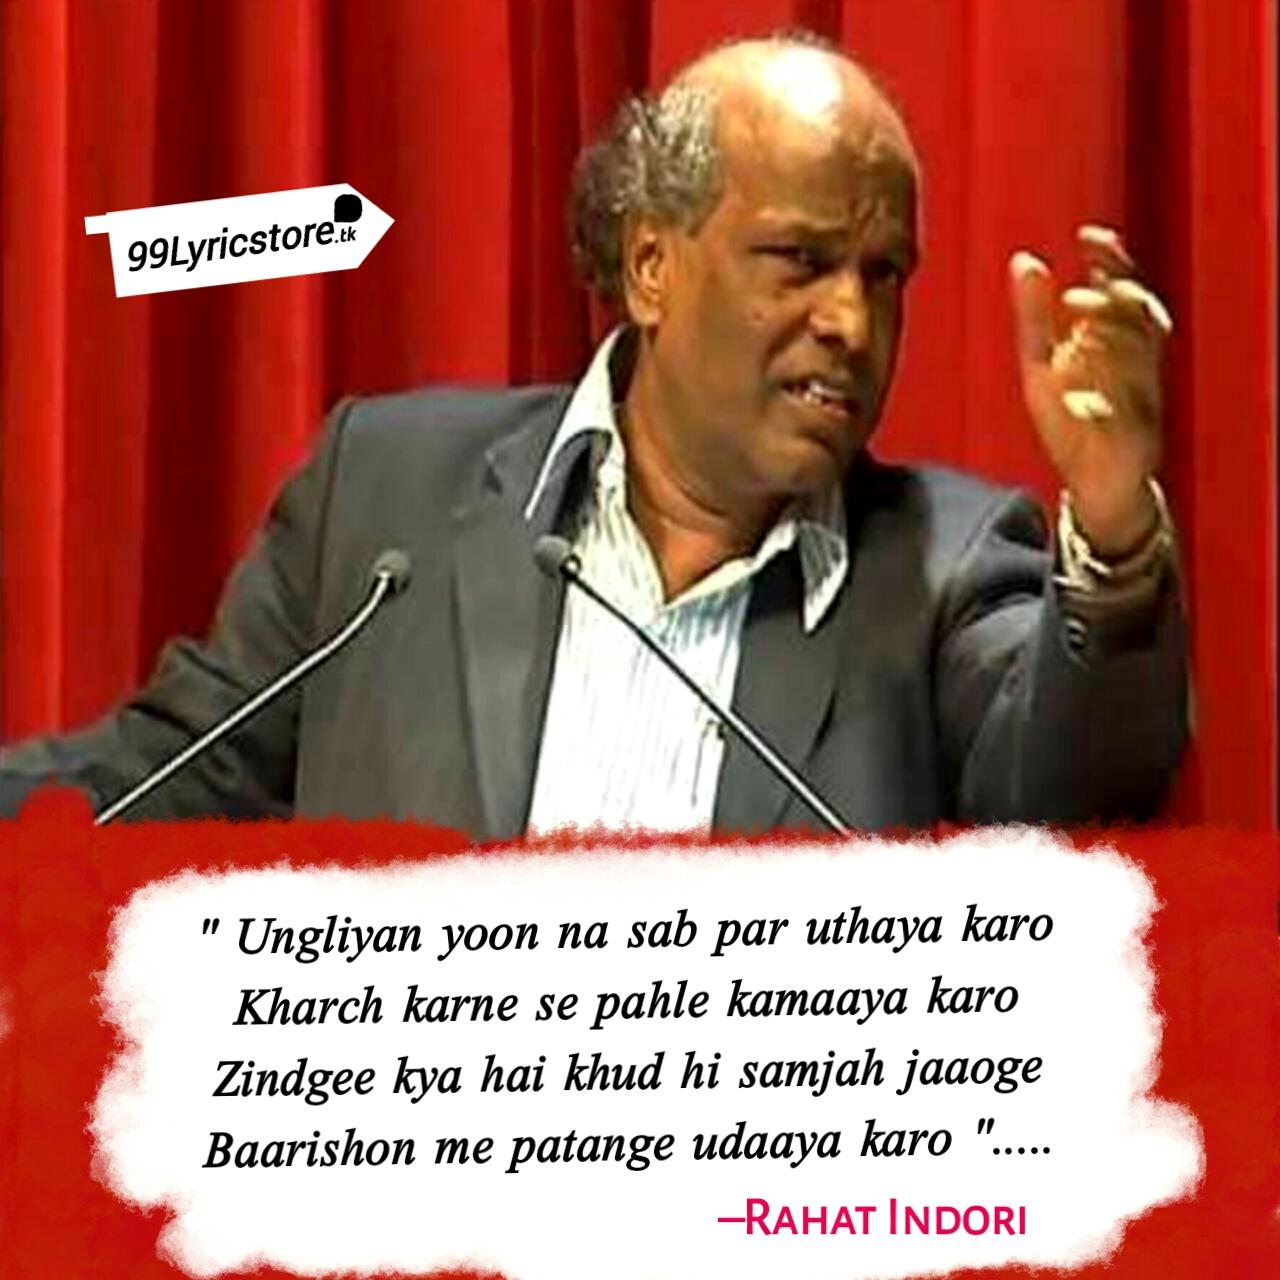 Ungliyan Yun Na Sab Par Uthaya Karo – Rahat Indori | Ghazal Poetry, Rahat Indori ki shayari, Rahat Indori quotes image, Dosti Poetry, Dosti poem. Rahat Indori mushaira, उँगलियाँ यूँ न सब पर उठाया करो  खर्च करने से पहले कमाया करो।